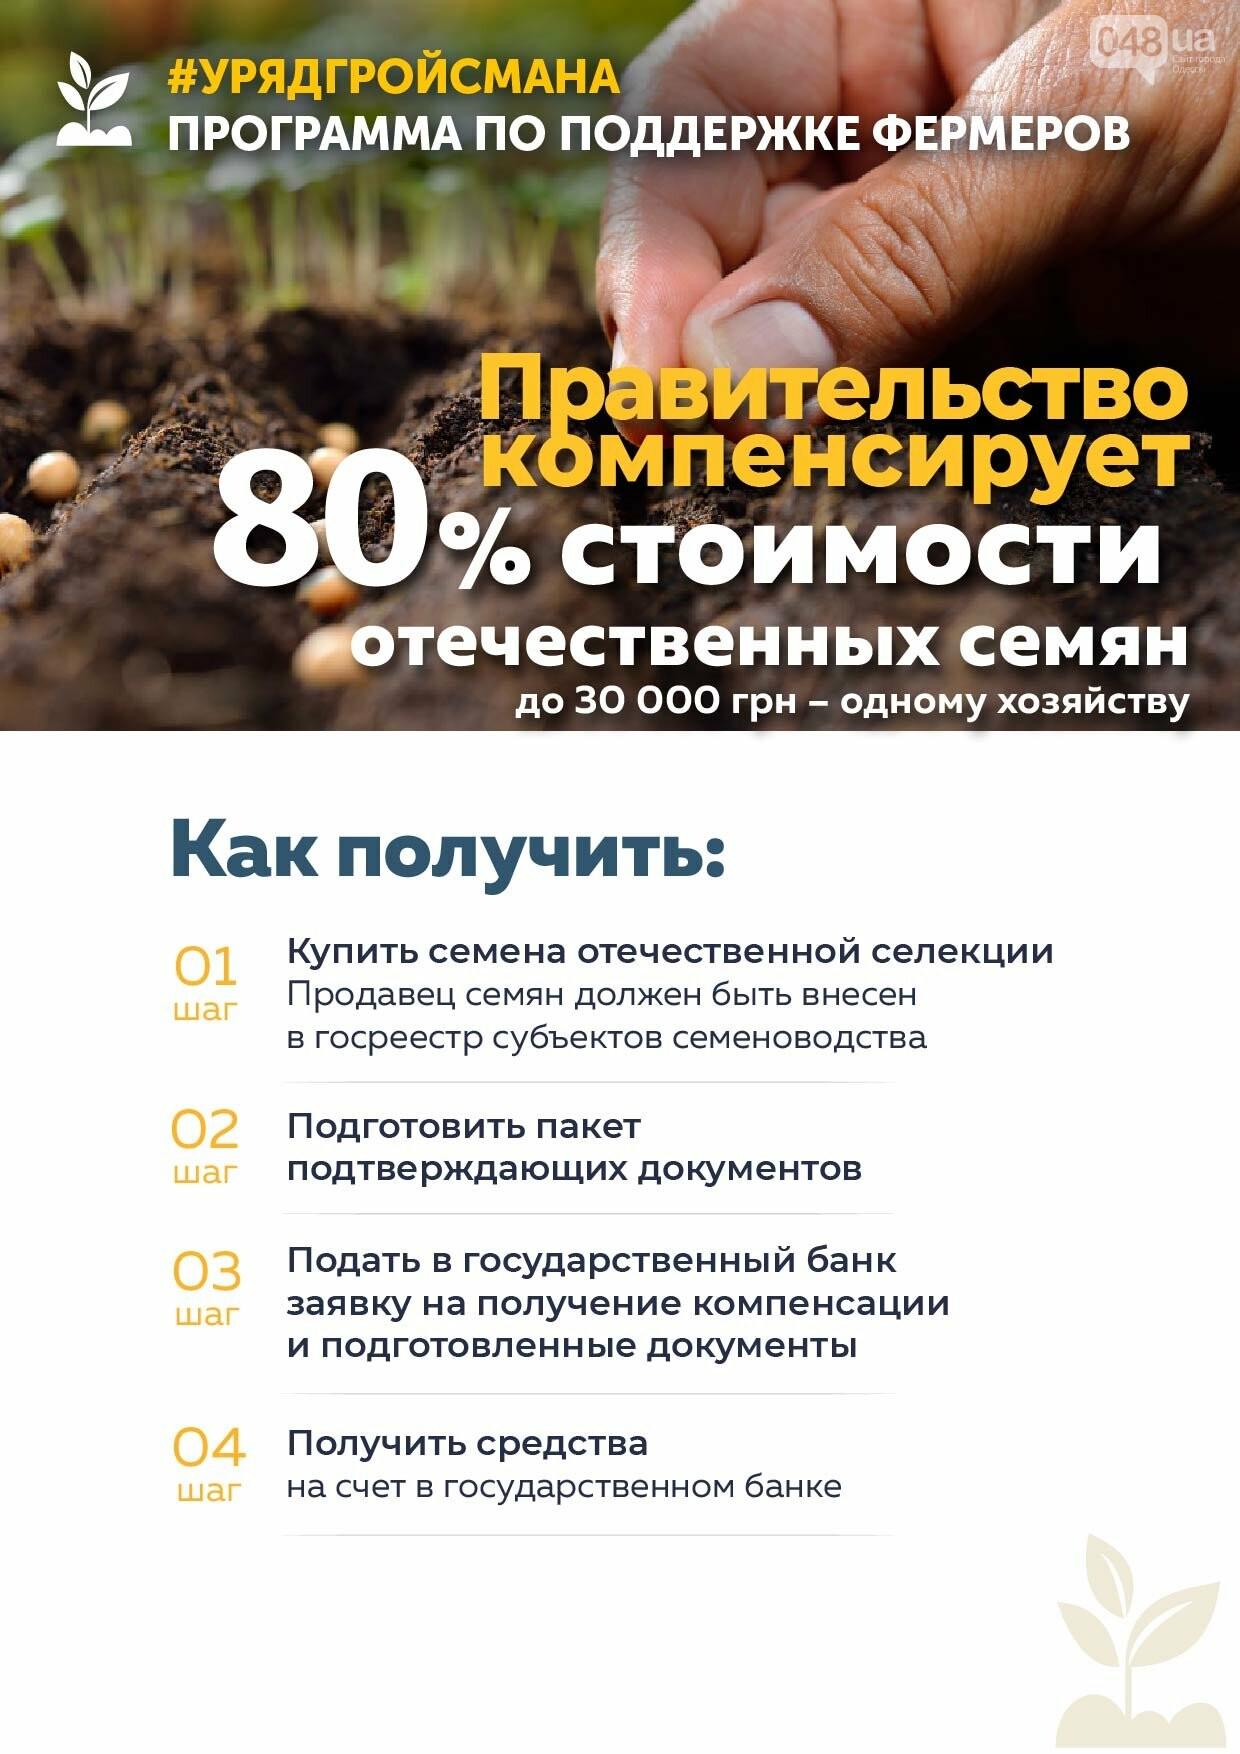 sg-5-rus_5b1a85b4640fc.jpg